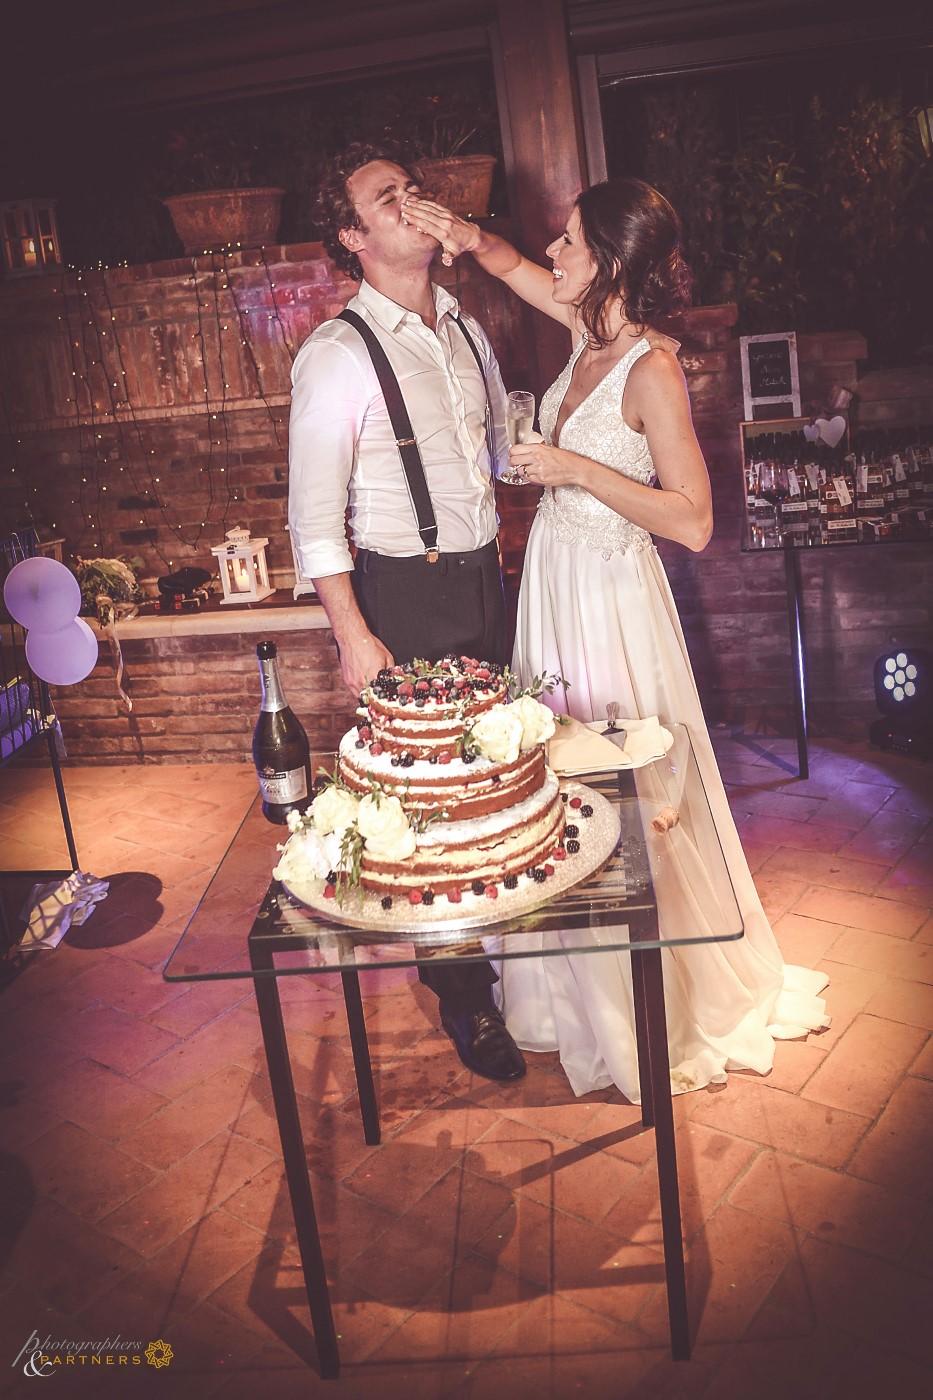 photographer_weddings_montepulciano_19.jpg